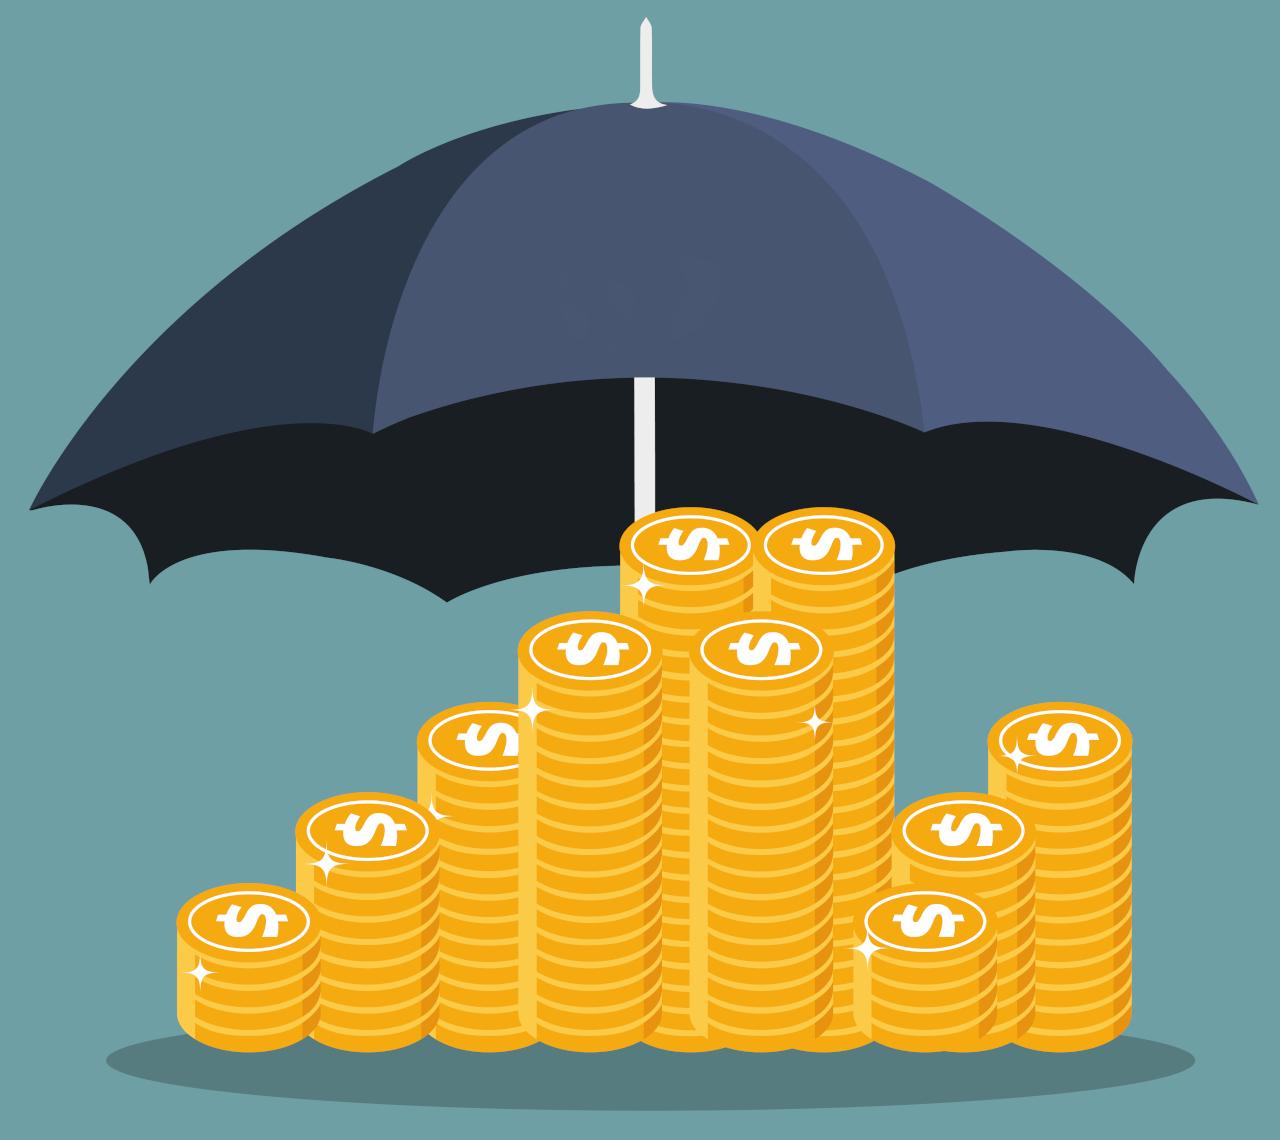 5 Binarium Tips Every Trader Should Follow